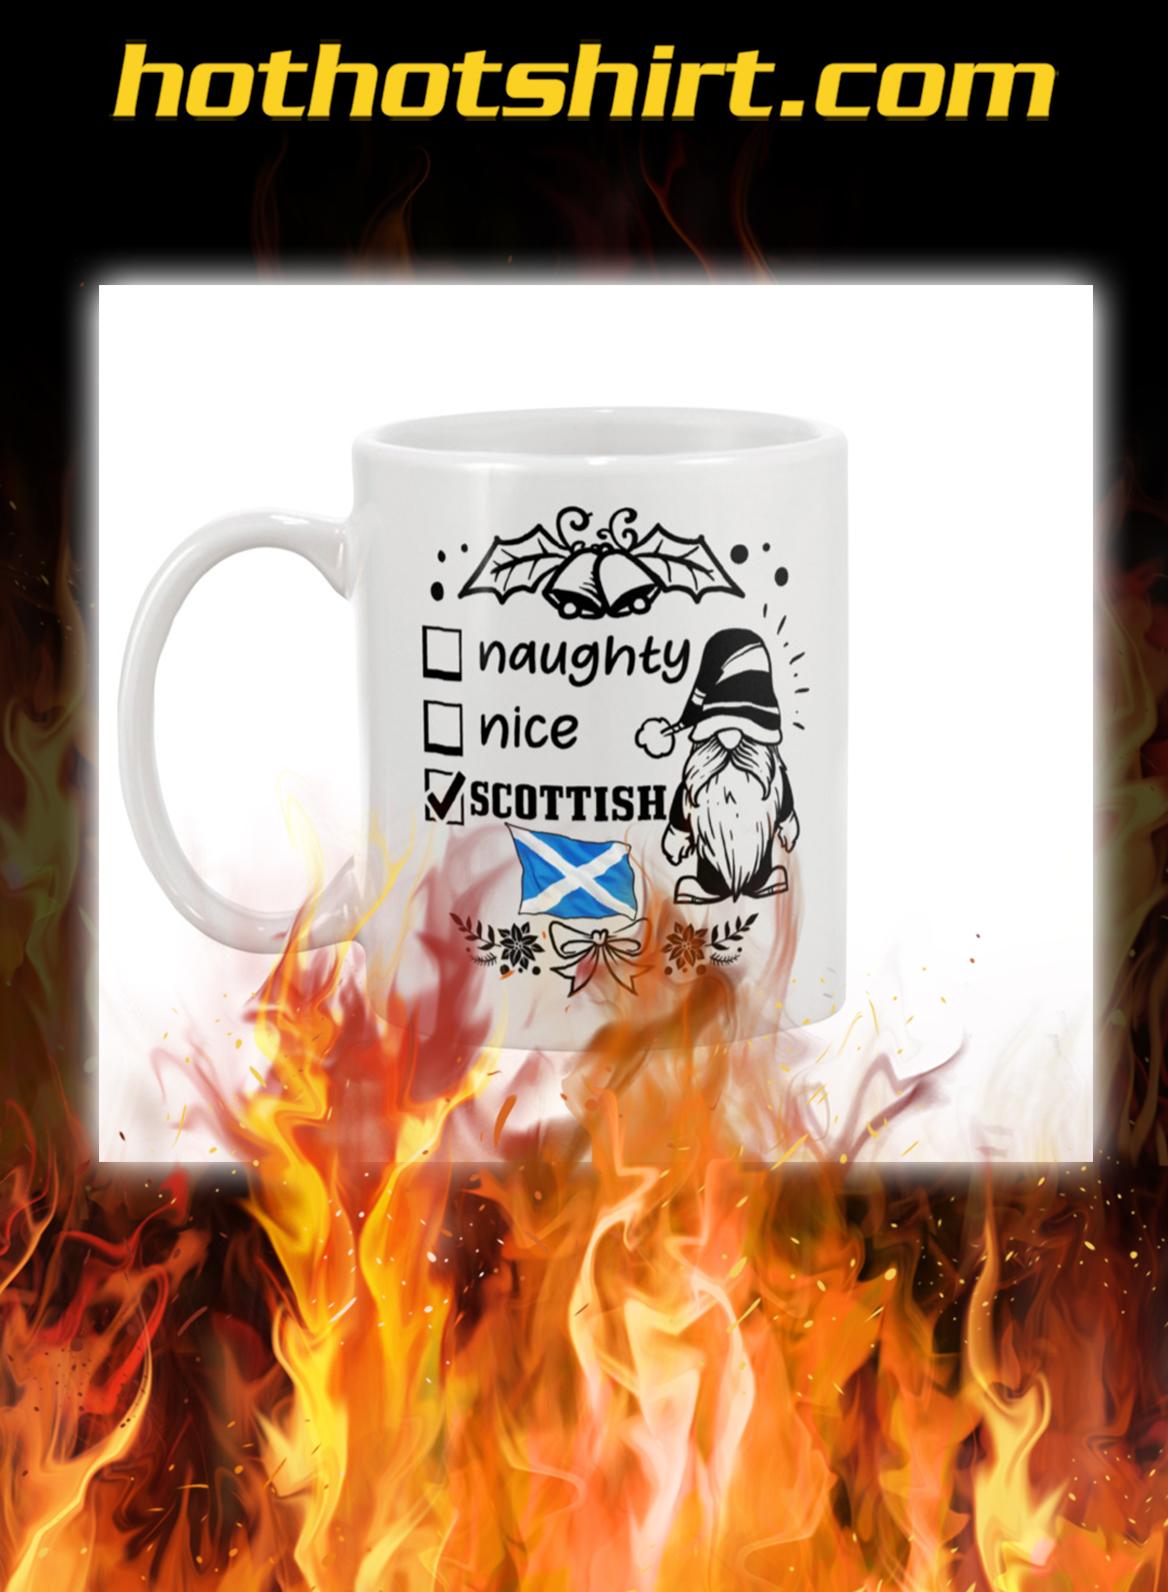 Gnomie Naughty nice scottish mug- pic 1